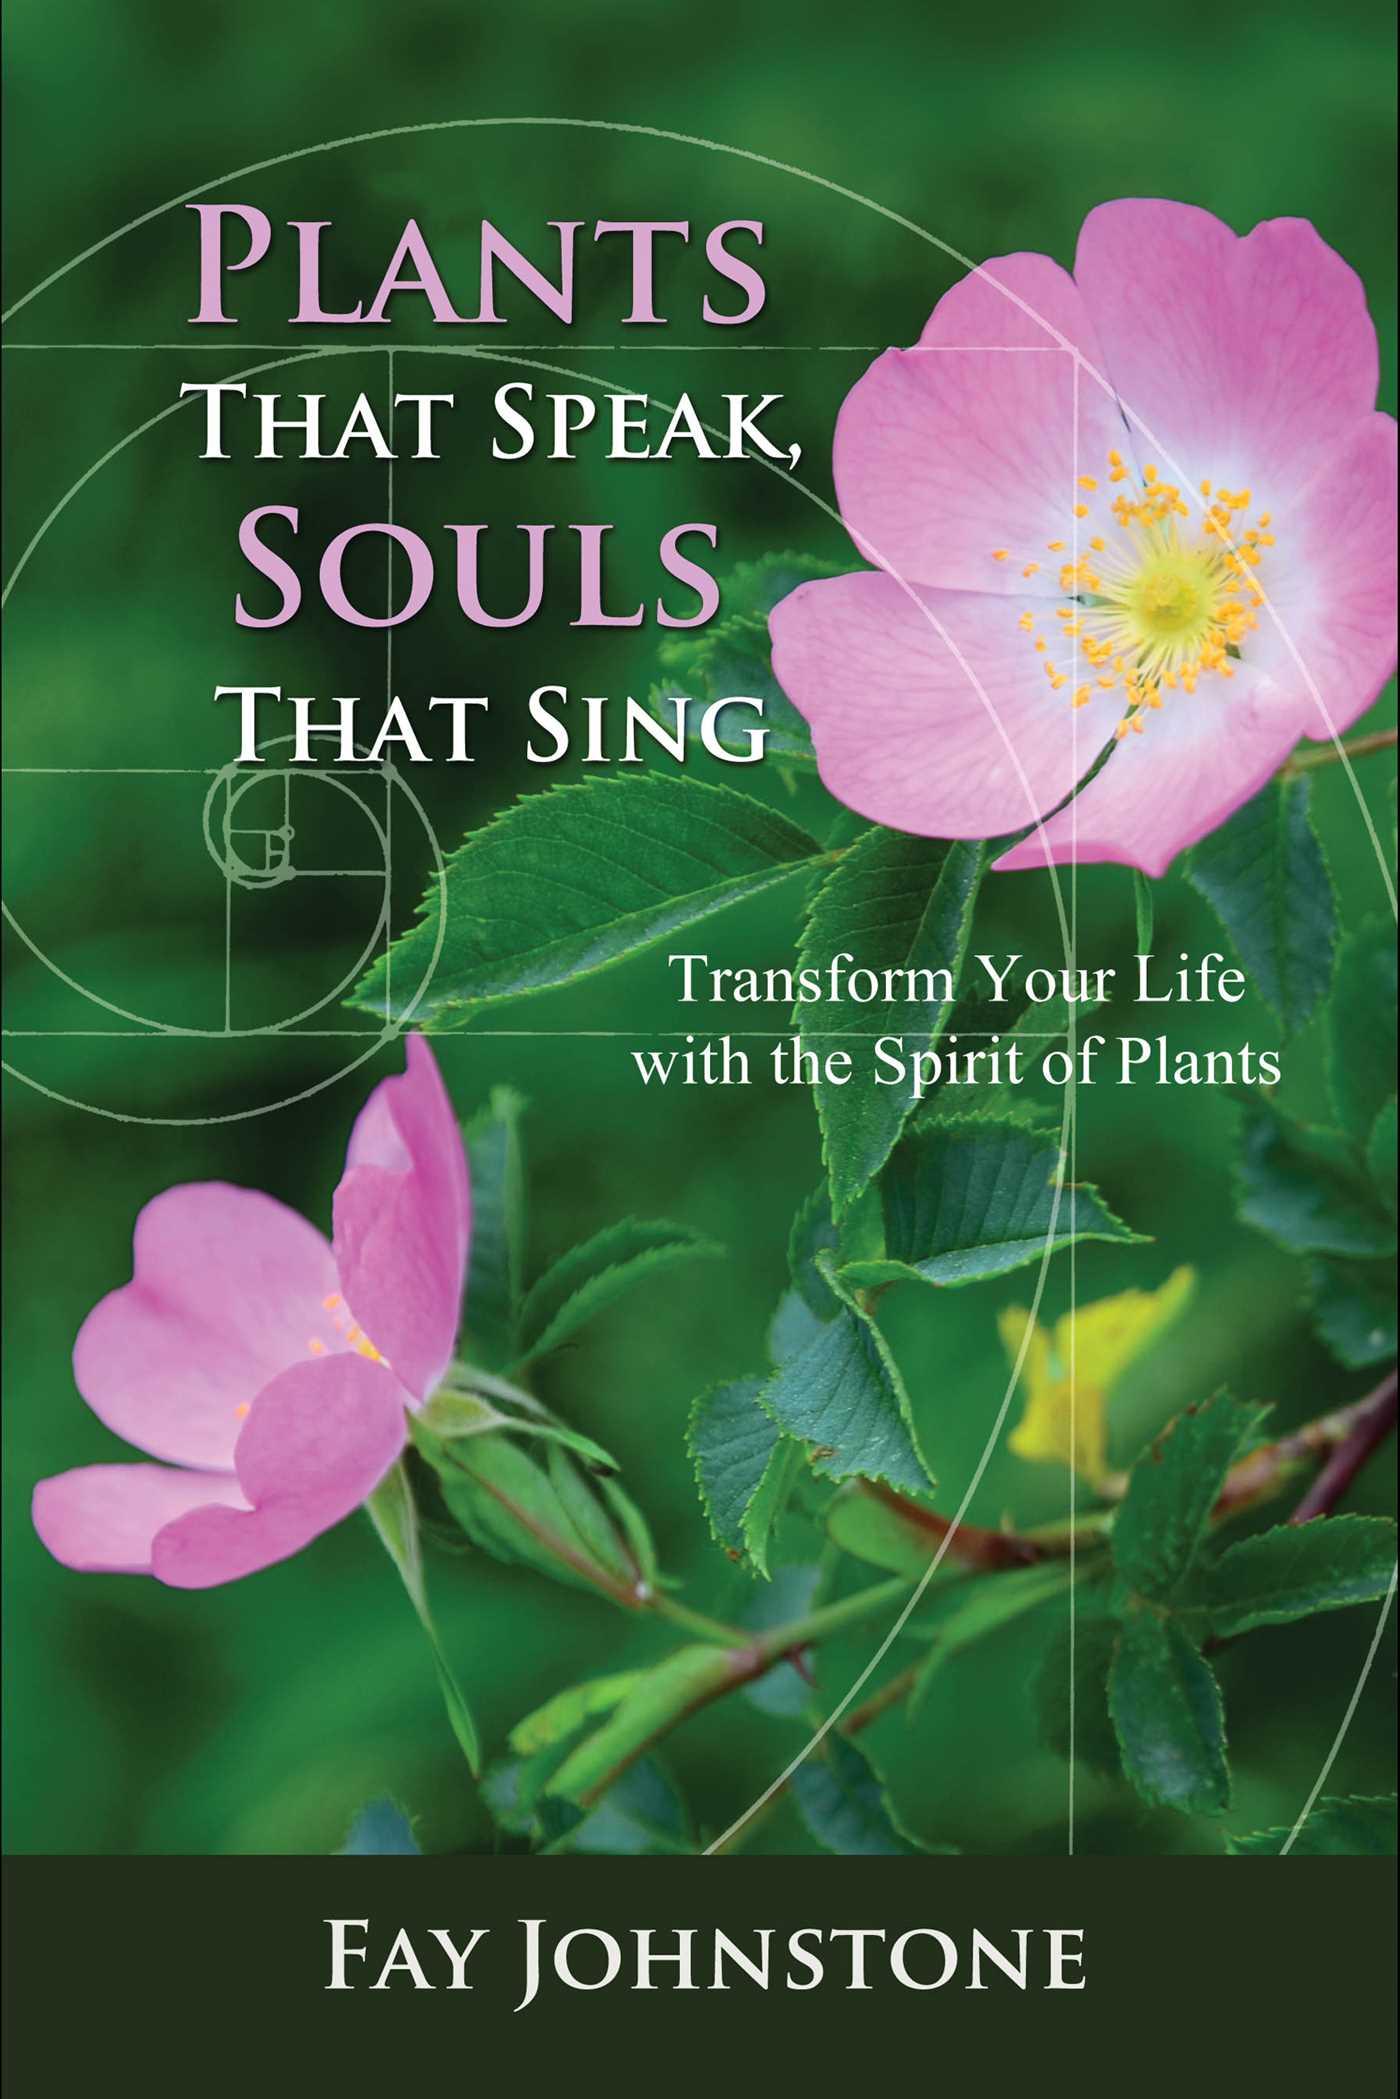 Plants that speak souls that sing 9781844097616 hr